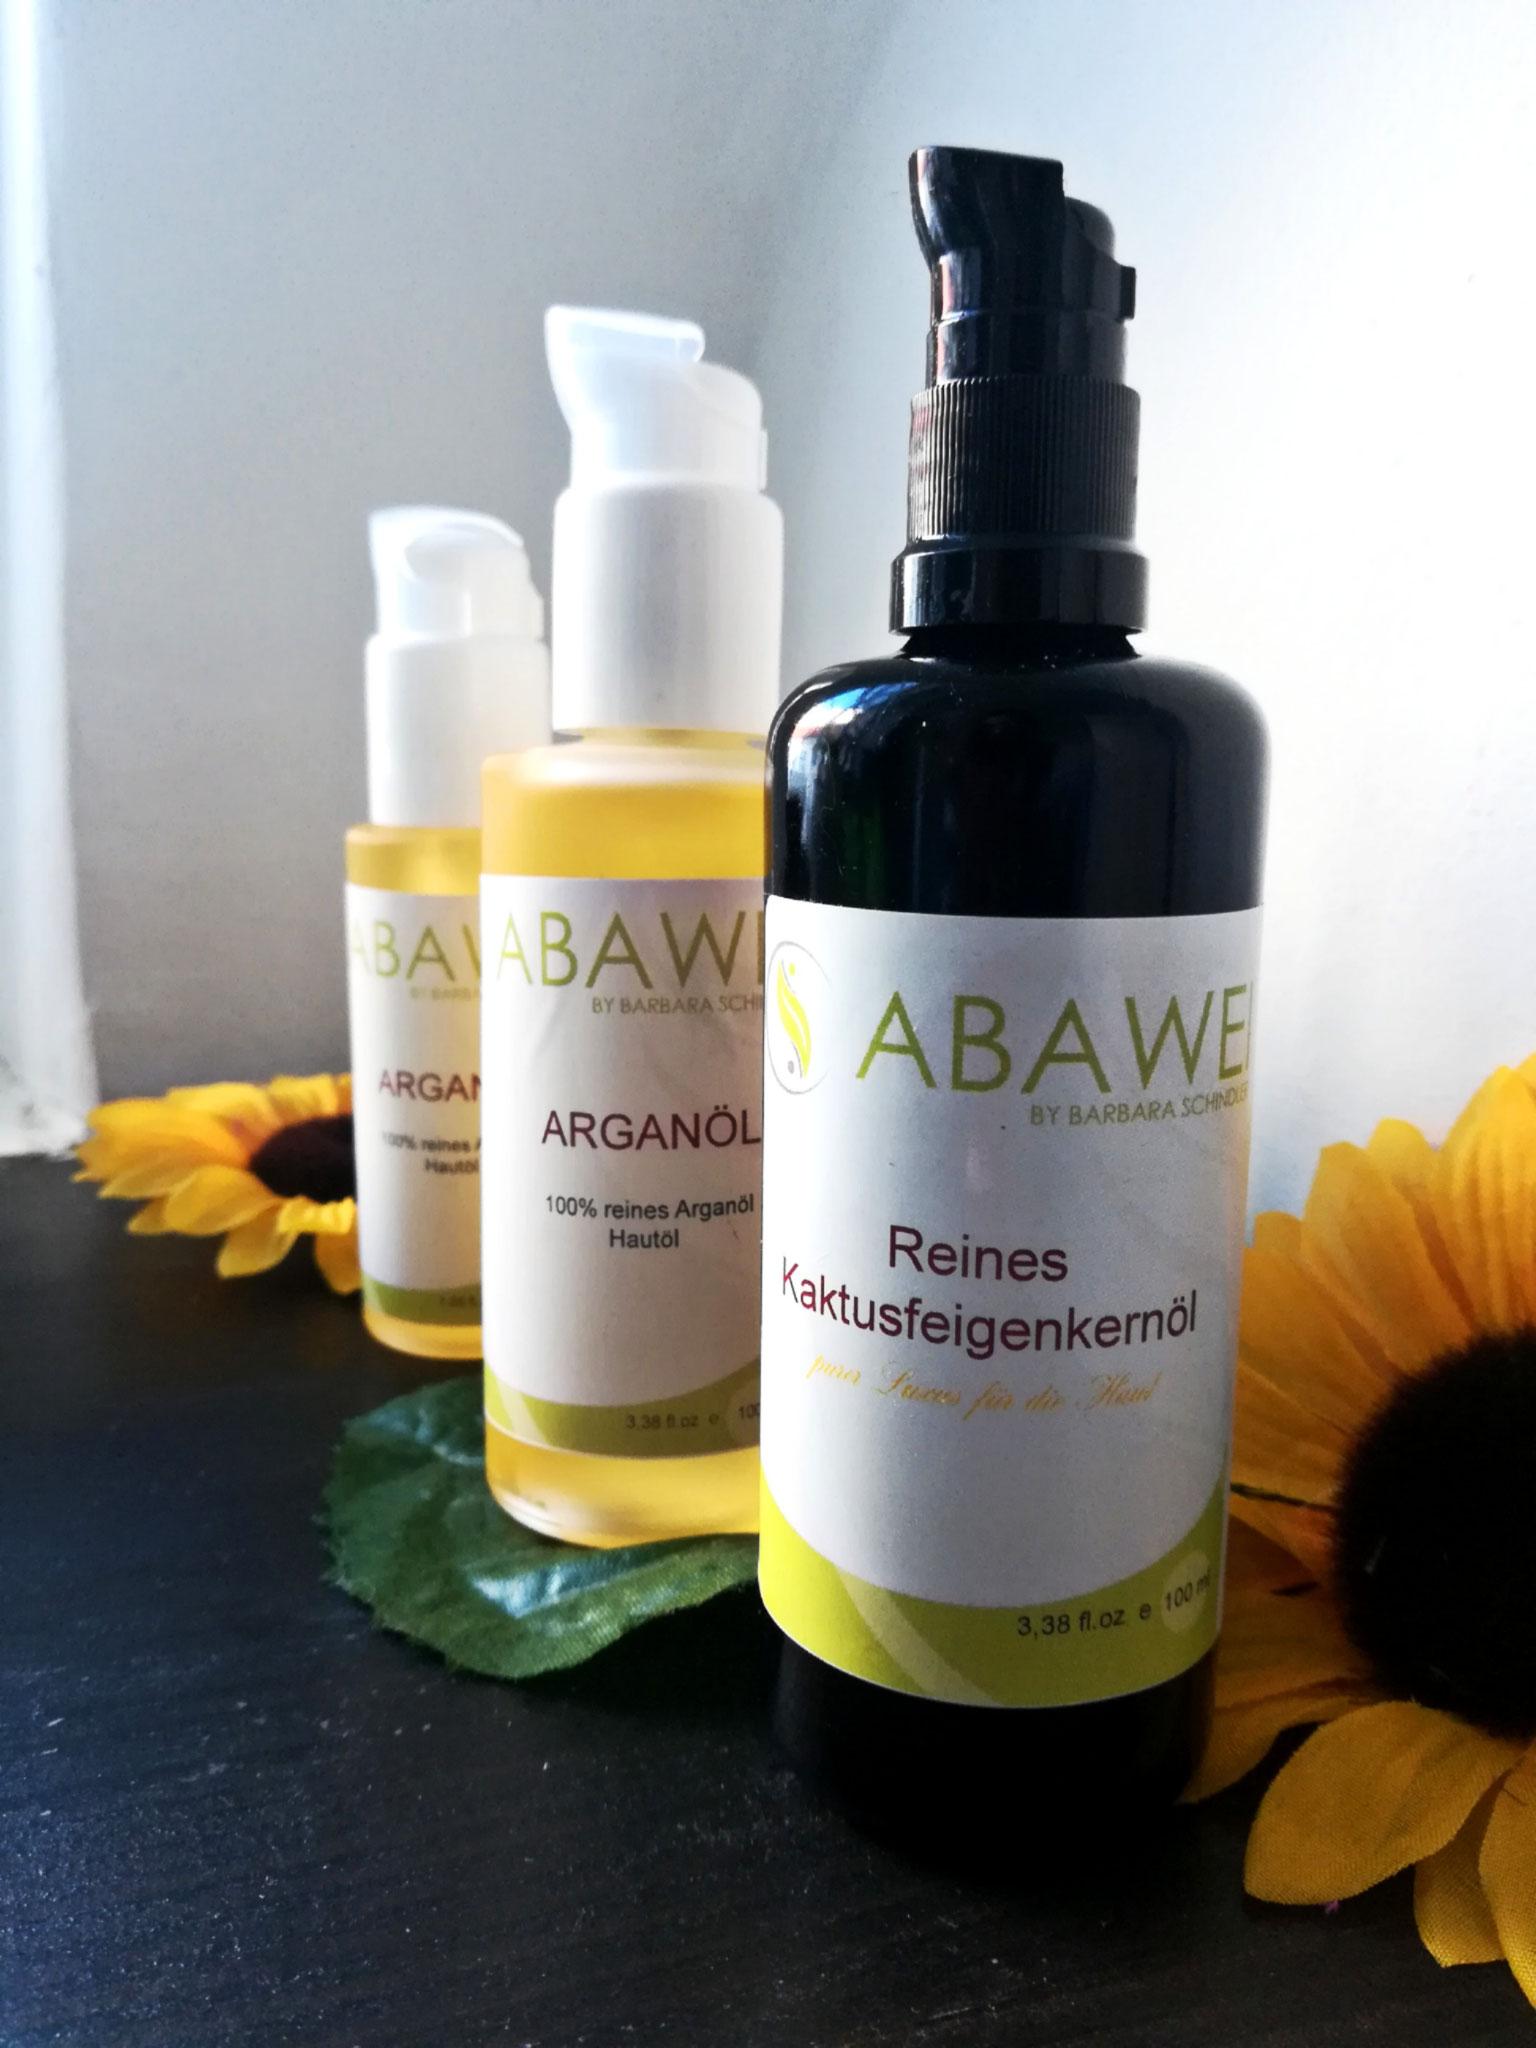 Abawei Arganöl 50ml/100ml, Abawei Kaktusfeigenkernöl